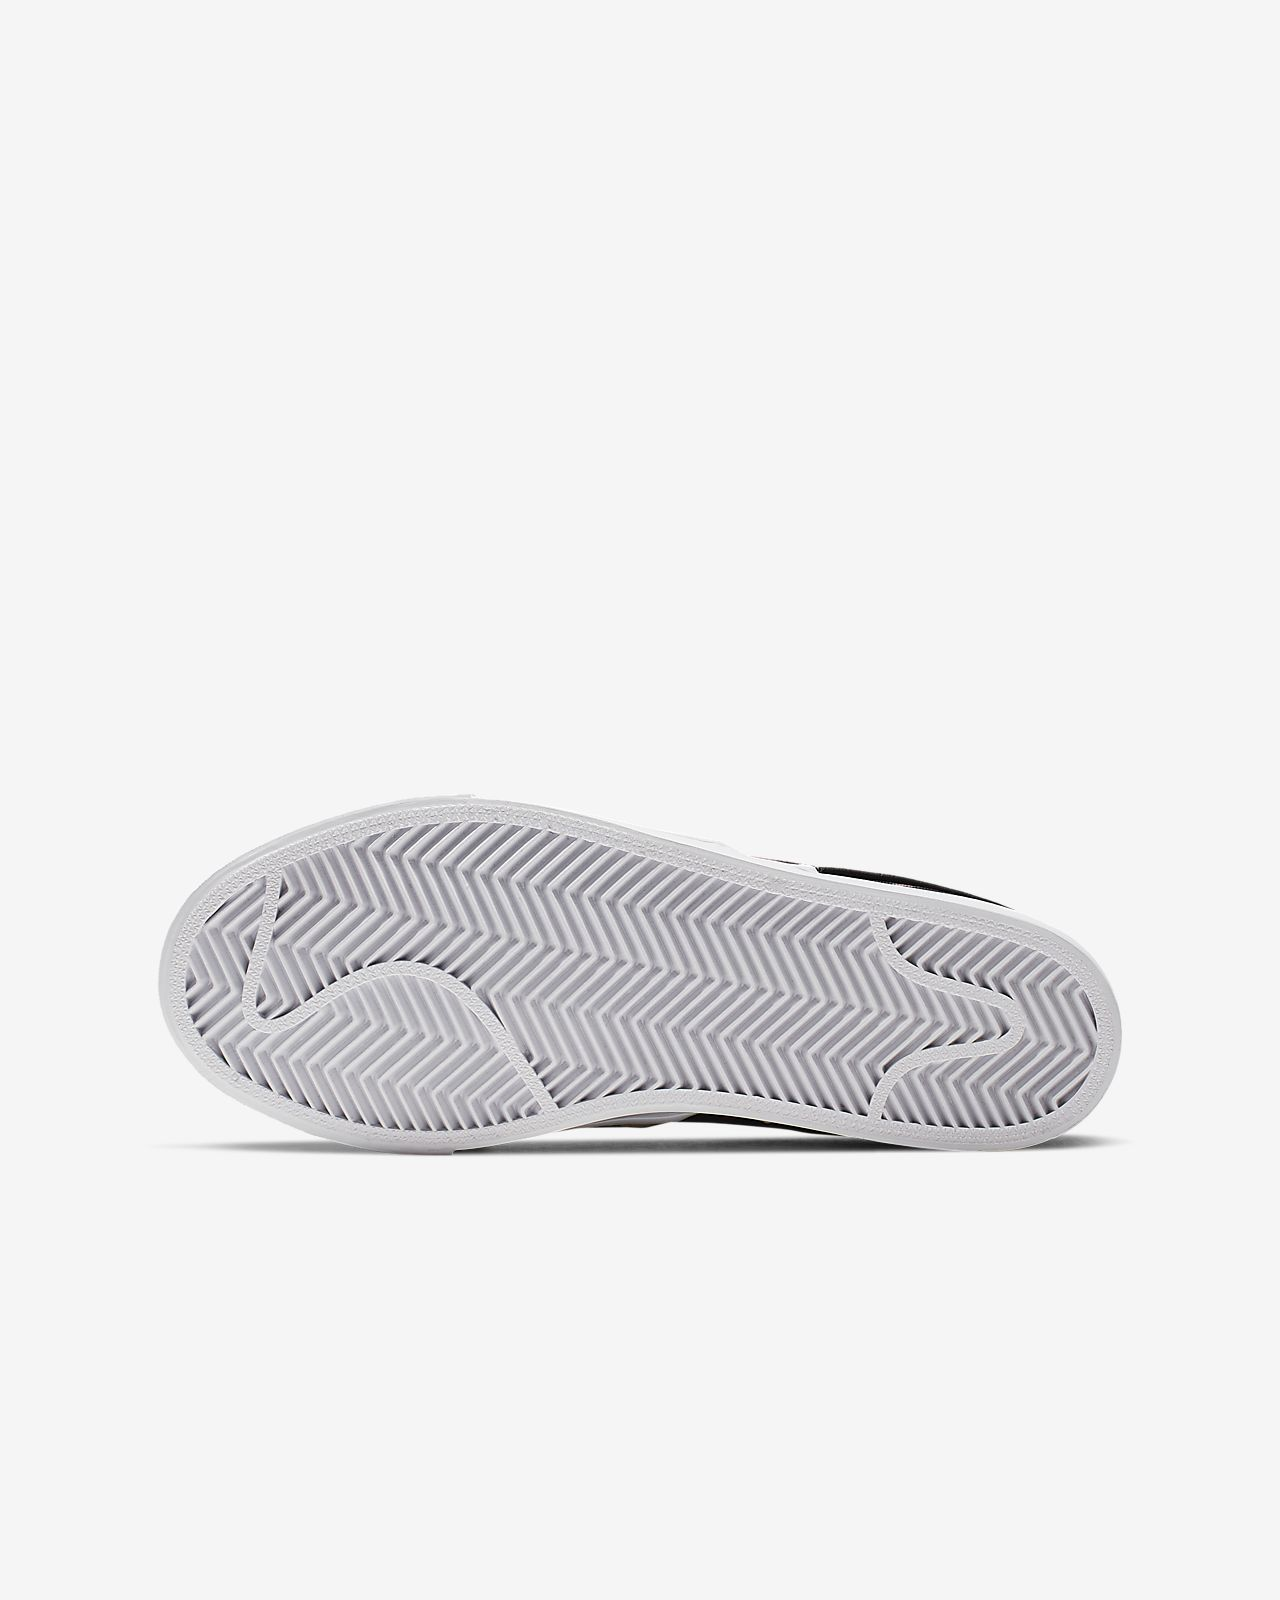 08f7088879 ... Nike SB Stefan Janoski Canvas Slip Tie Dye deszkás cipő nagyobb  gyerekeknek